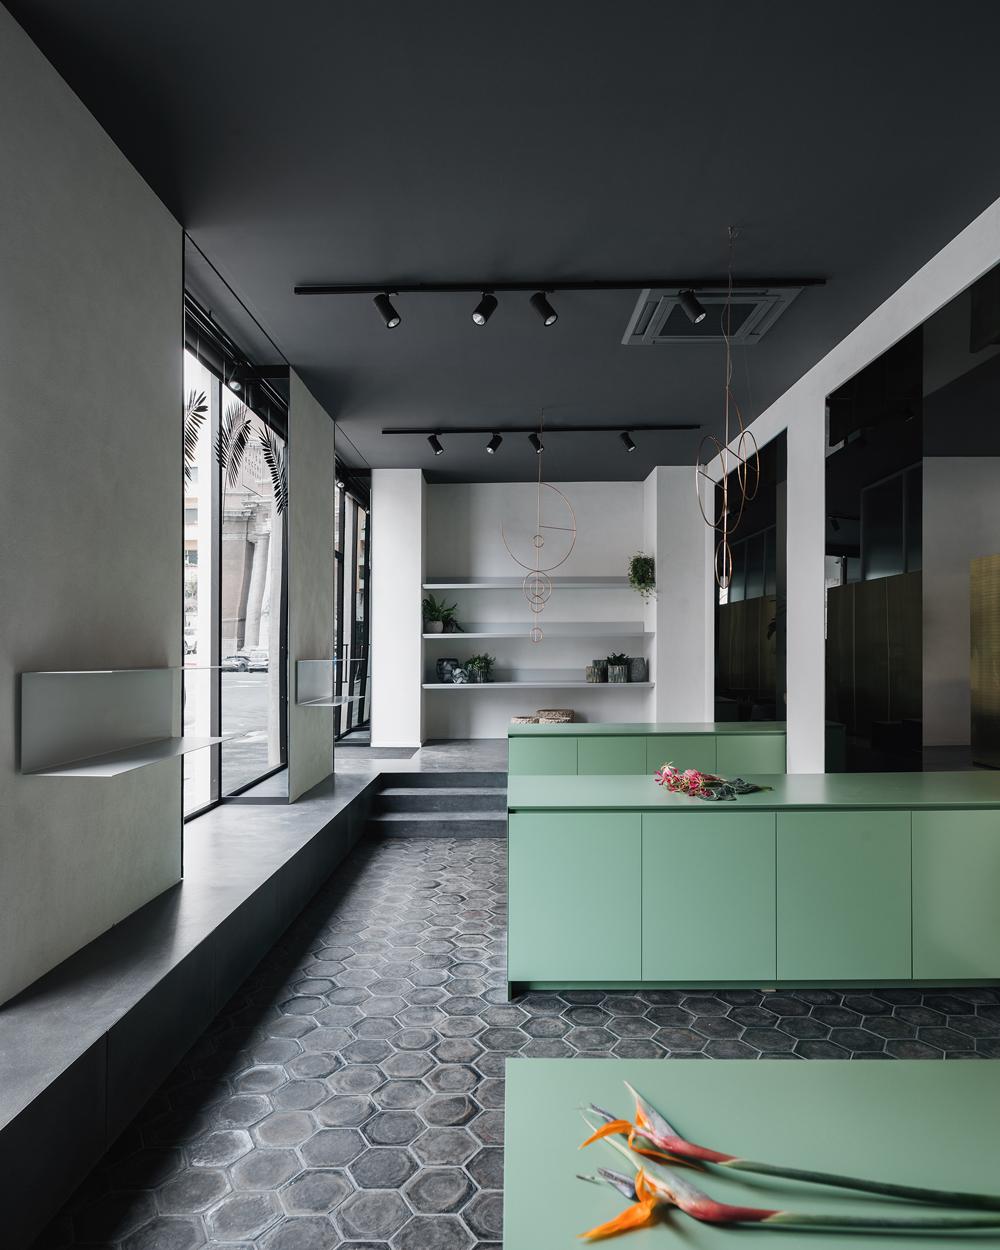 maria-luisa-rocchi-bevilacqua-architects-01